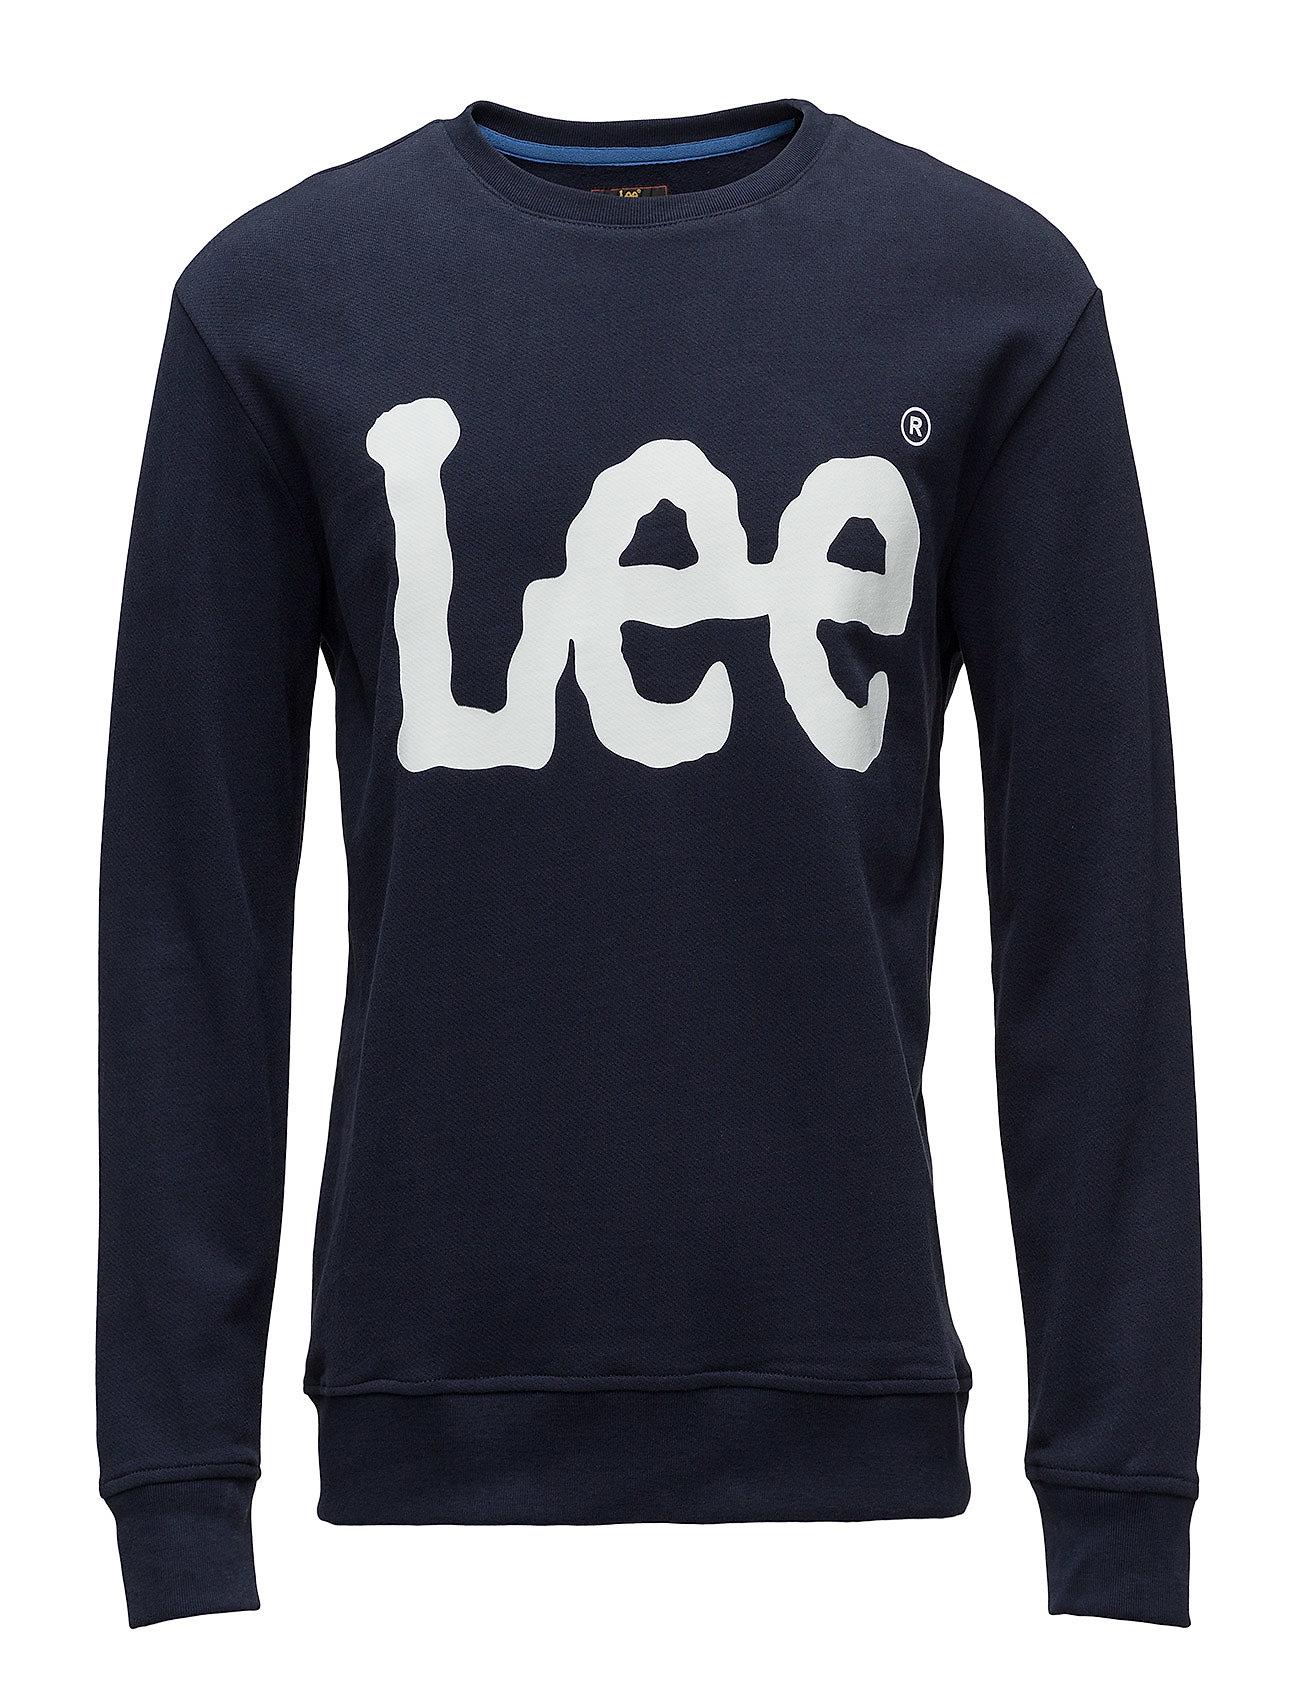 Lee Jeans LOGO SWS - NIGHT SKY